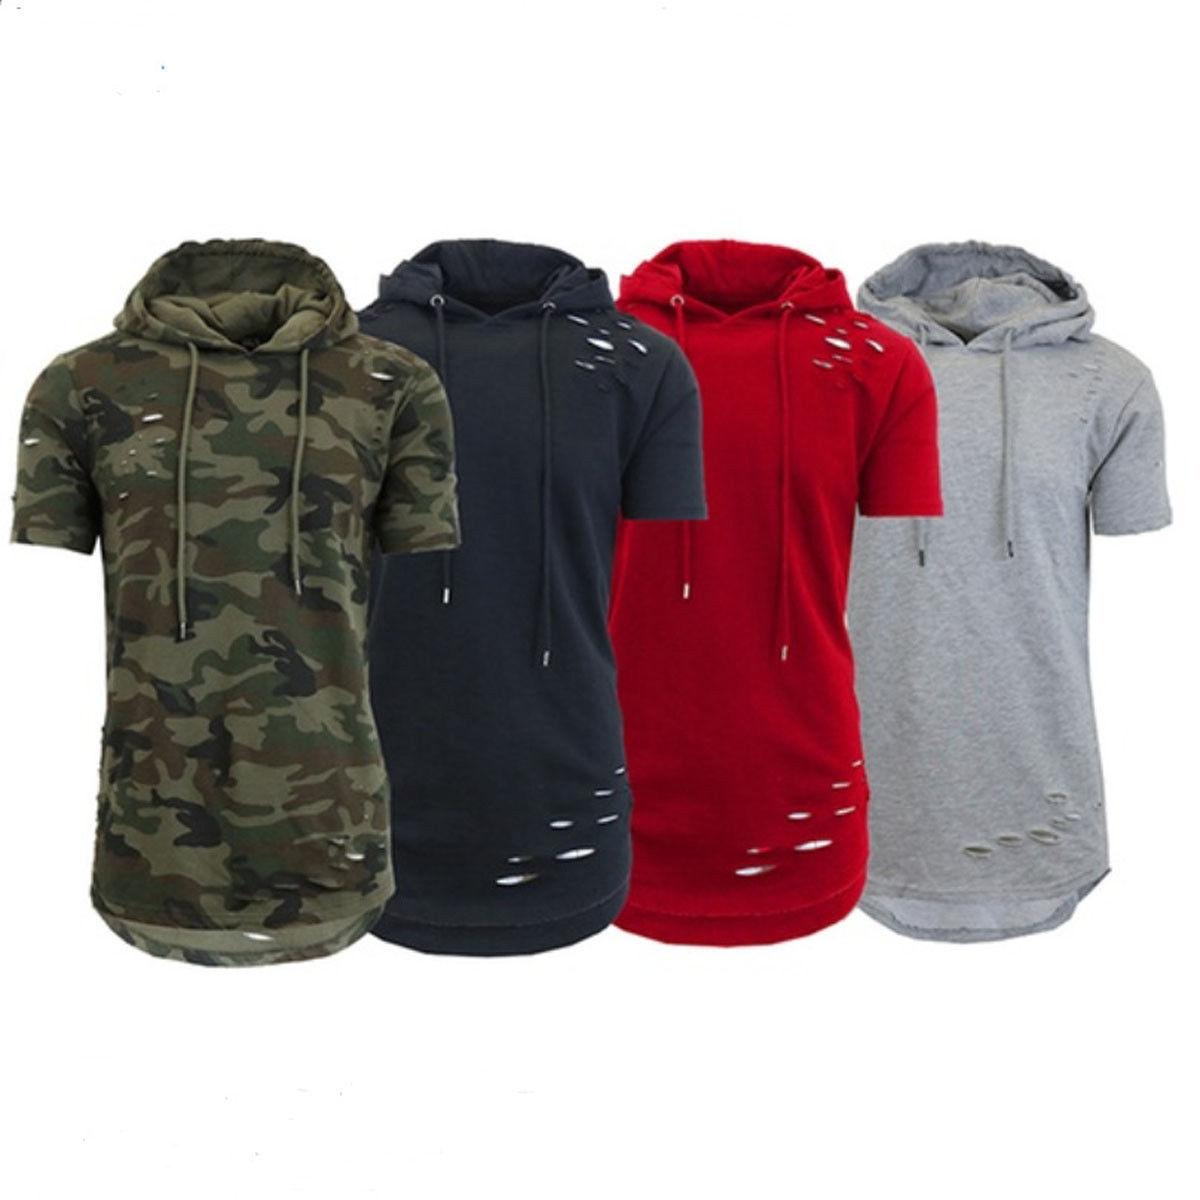 2018 Short Sleeve Hoodies Fashion Slim Hooded Sweatshirt Men Hip Hop Hoodie Men's Rapper Vest Top Camisa Masculina Clothes Durable In Use